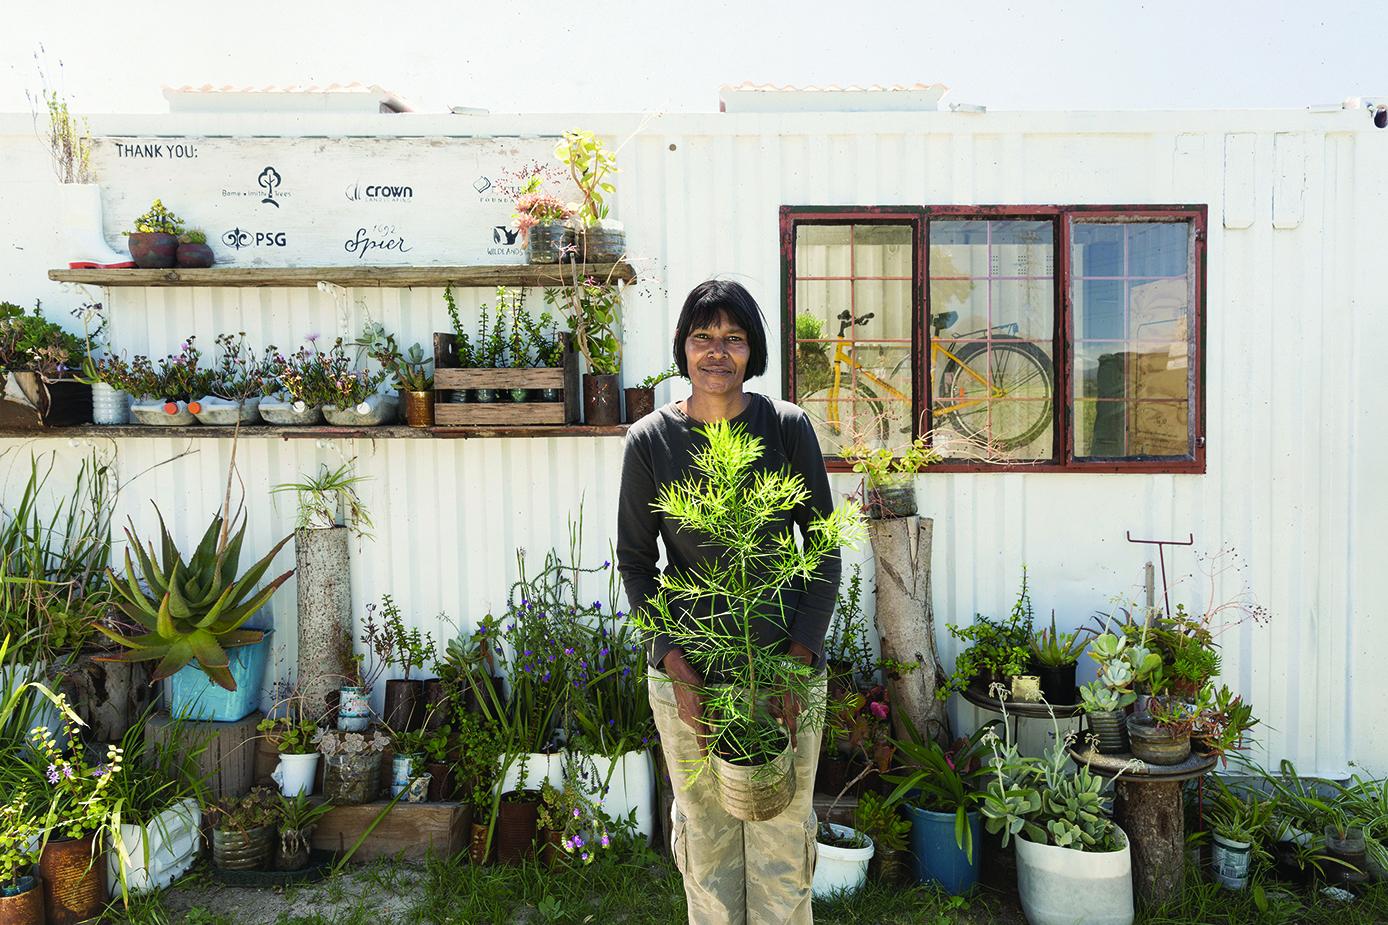 Spier wins Amorim International Biodiversity for Indigenous Replanting Programme photo